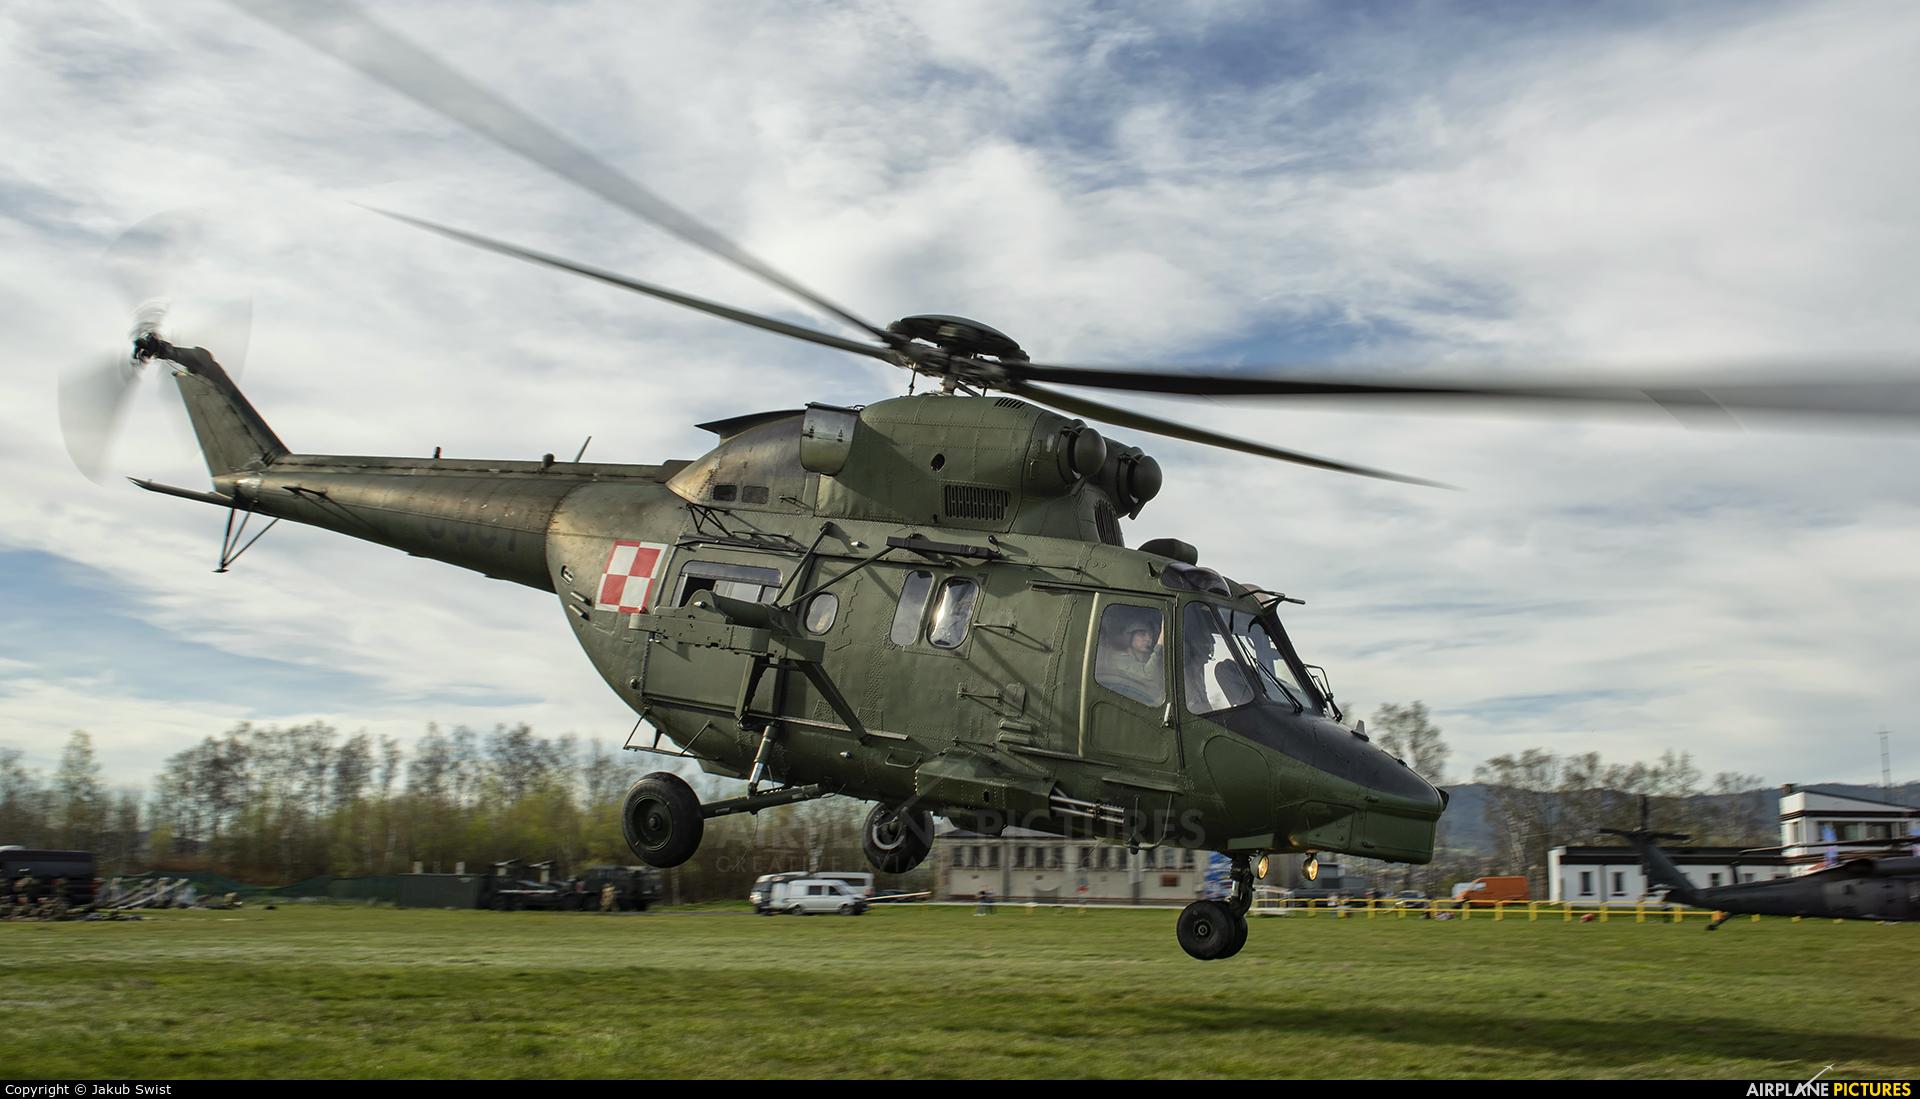 Poland - Air Force 0807 aircraft at Nowy Targ Airport